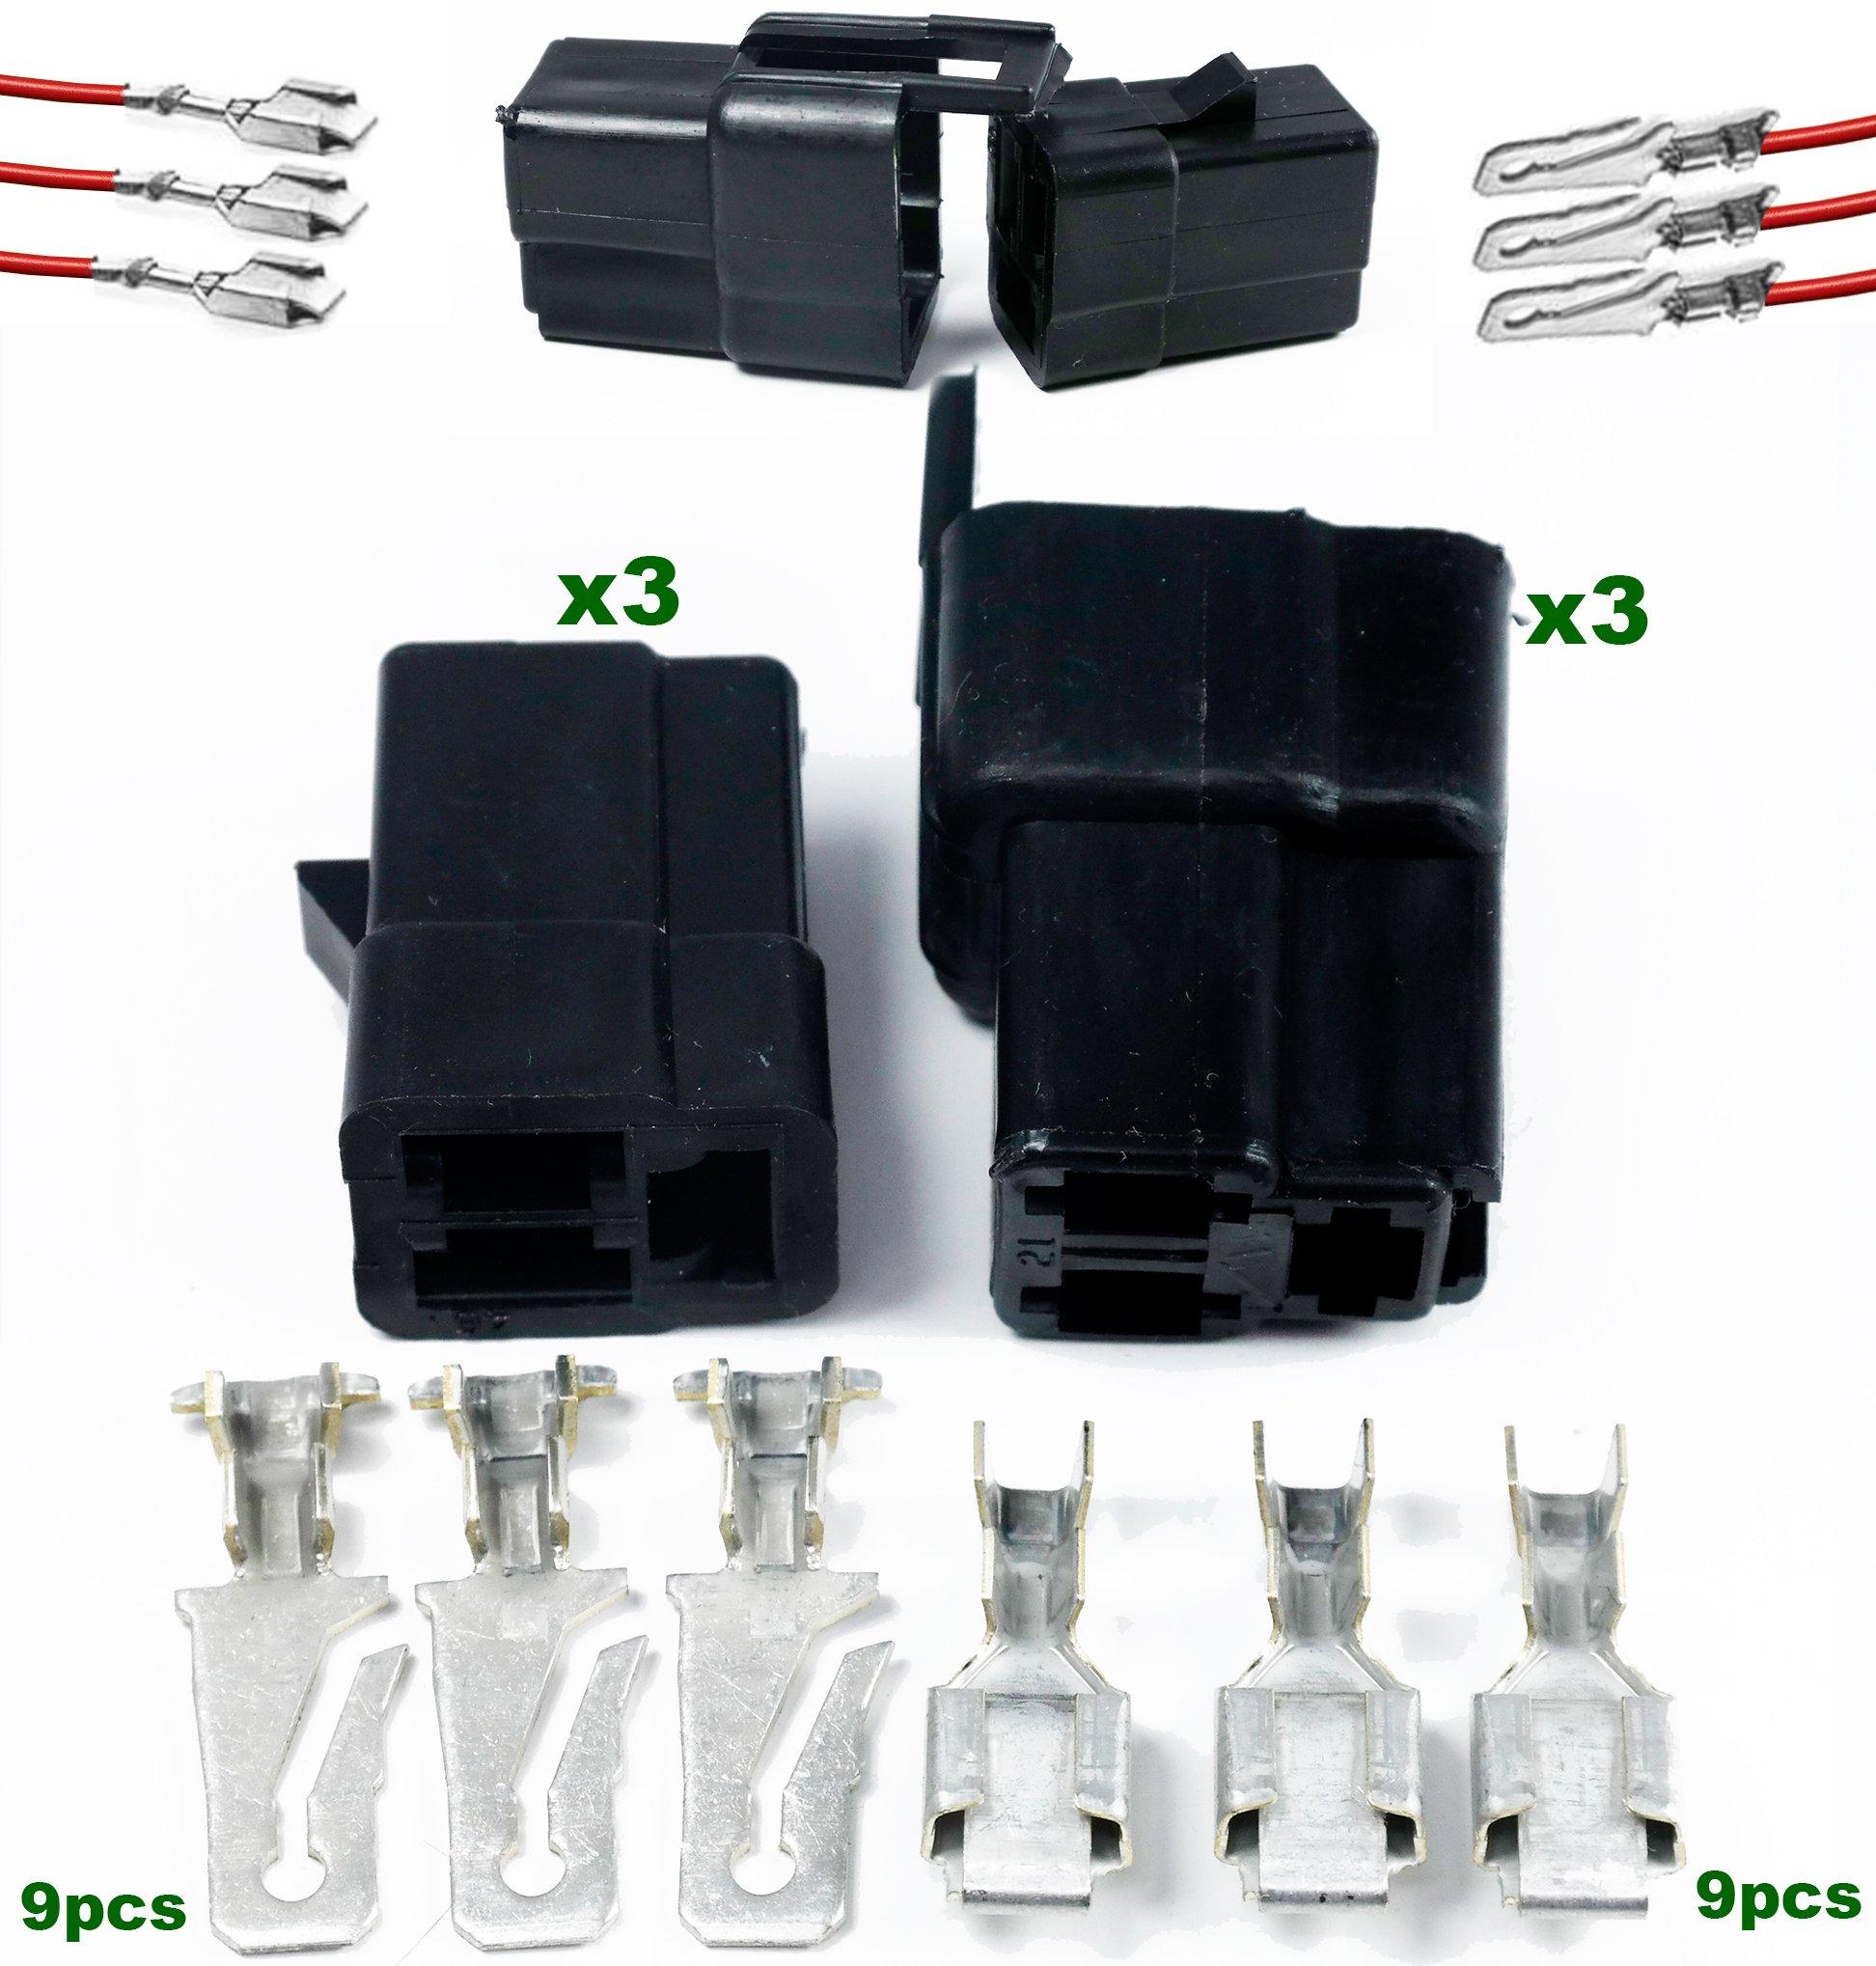 Clipsandfasteners Inc 15 Metri-Pack 280 Series Tangless Terminal 18-16 Ga.For GM